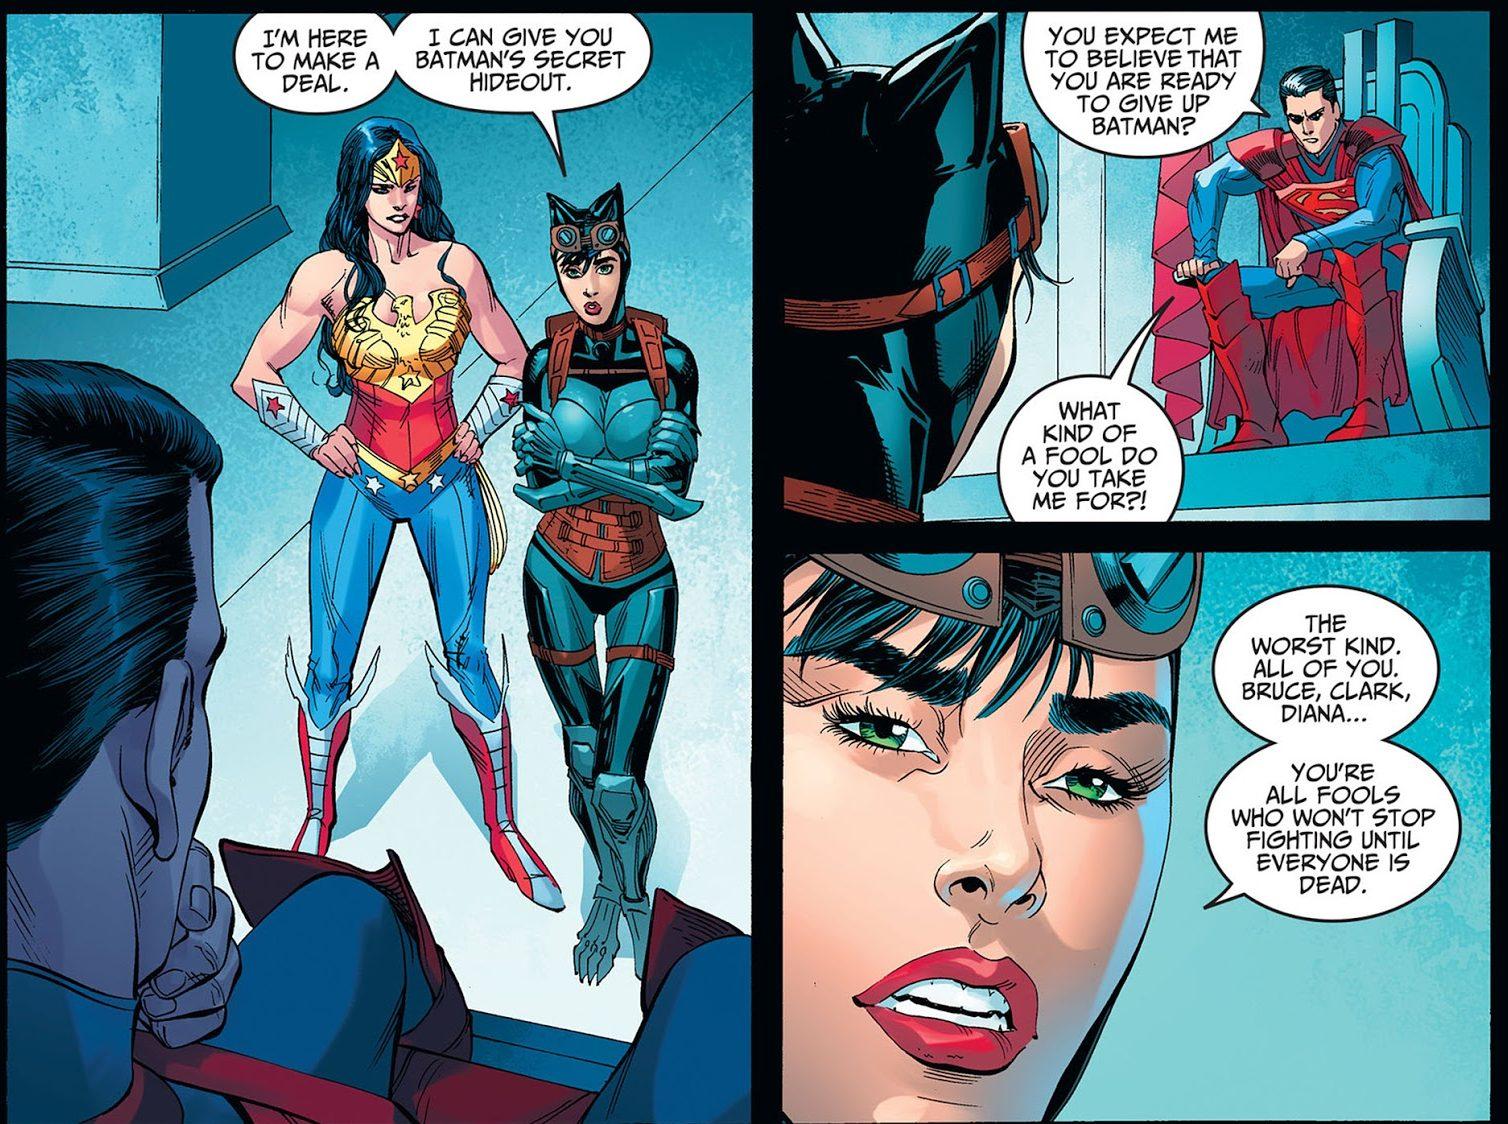 Catwoman Betrays Batman (Injustice Gods Among Us)